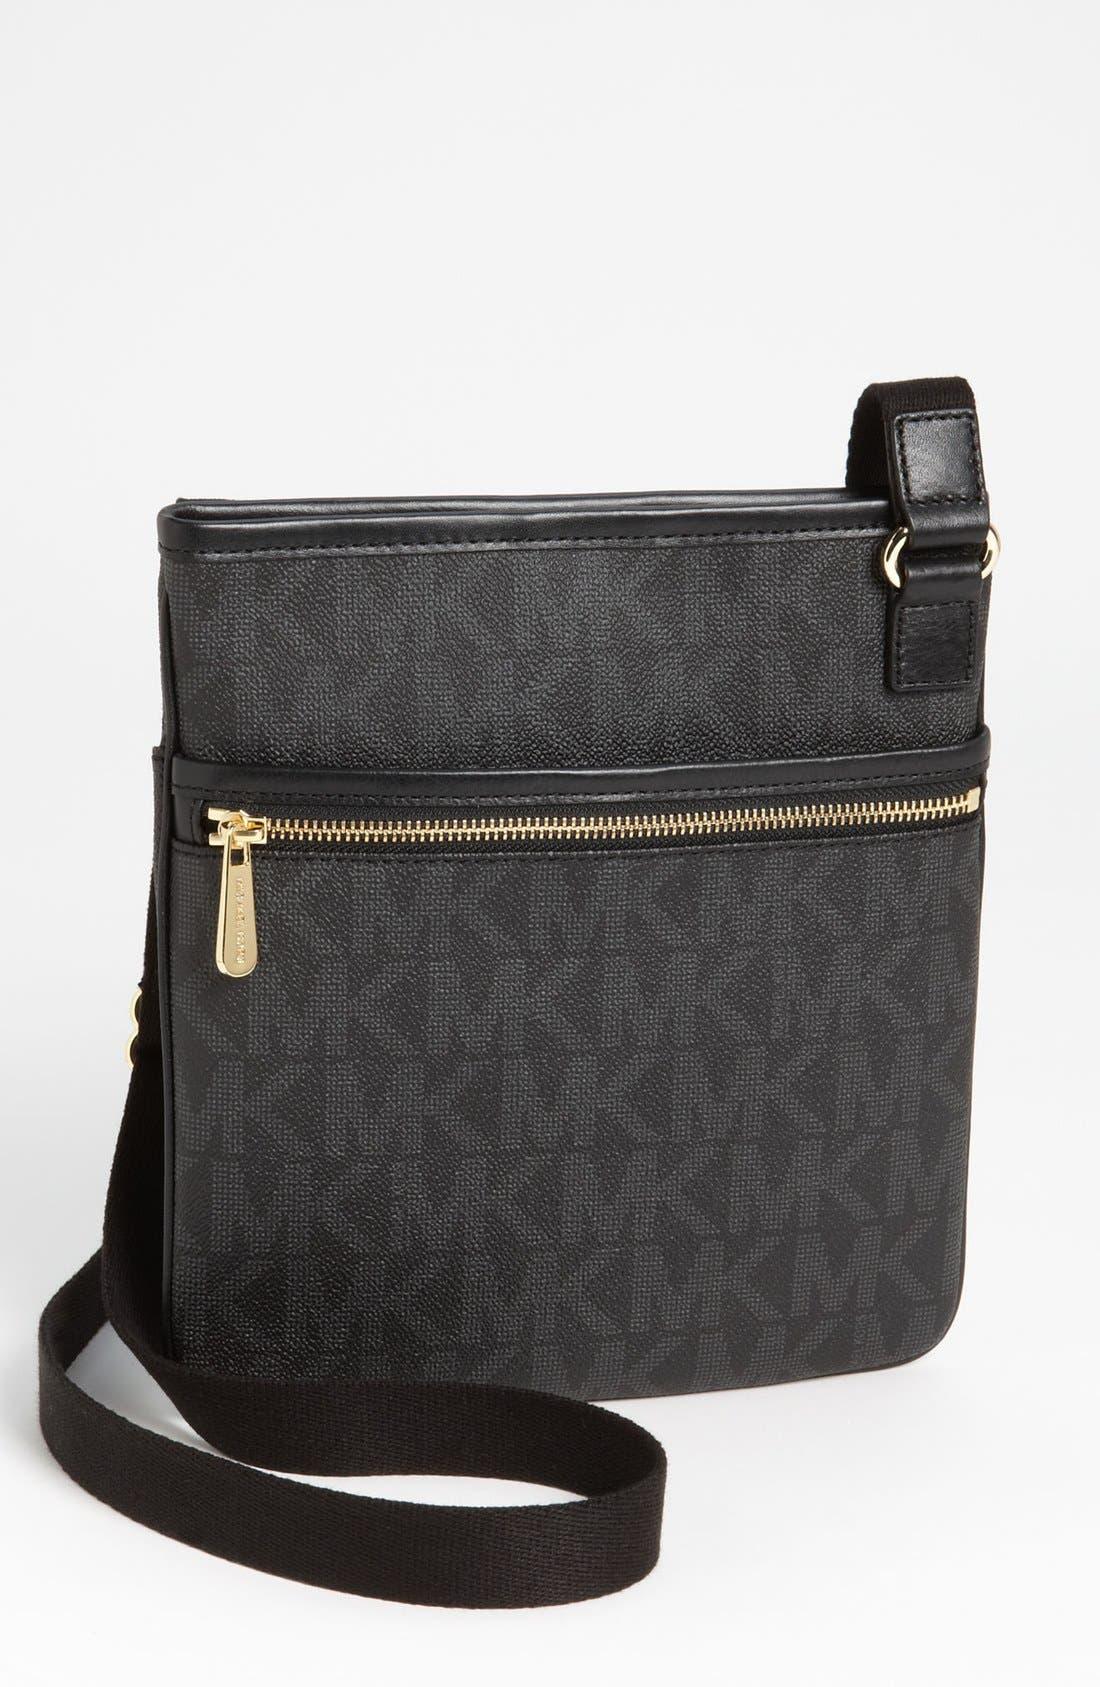 Main Image - MICHAEL Michael Kors 'Signature' Crossbody Bag